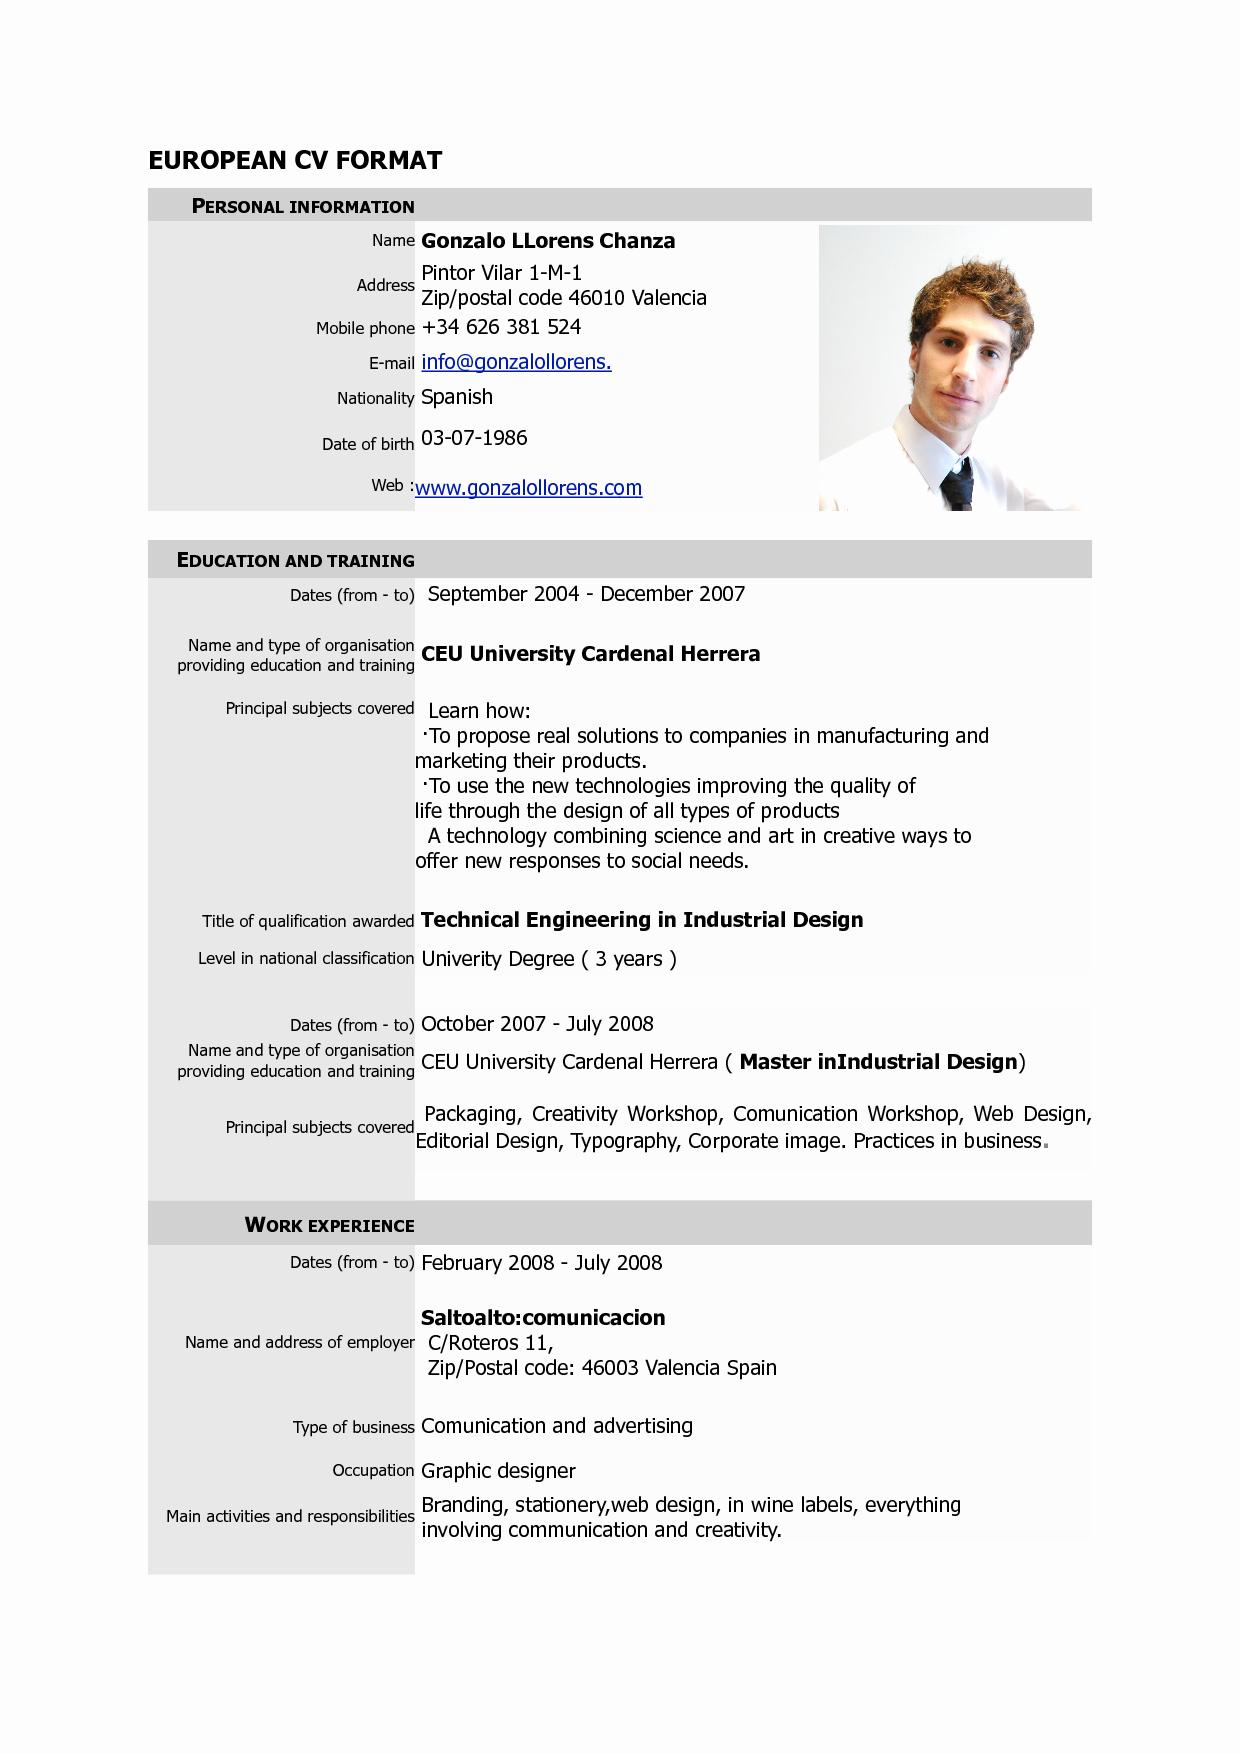 Curriculum Vitae Examples Pdf Elegant Free Download Cv Europass Pdf Europass Home European Cv format Pdf 6